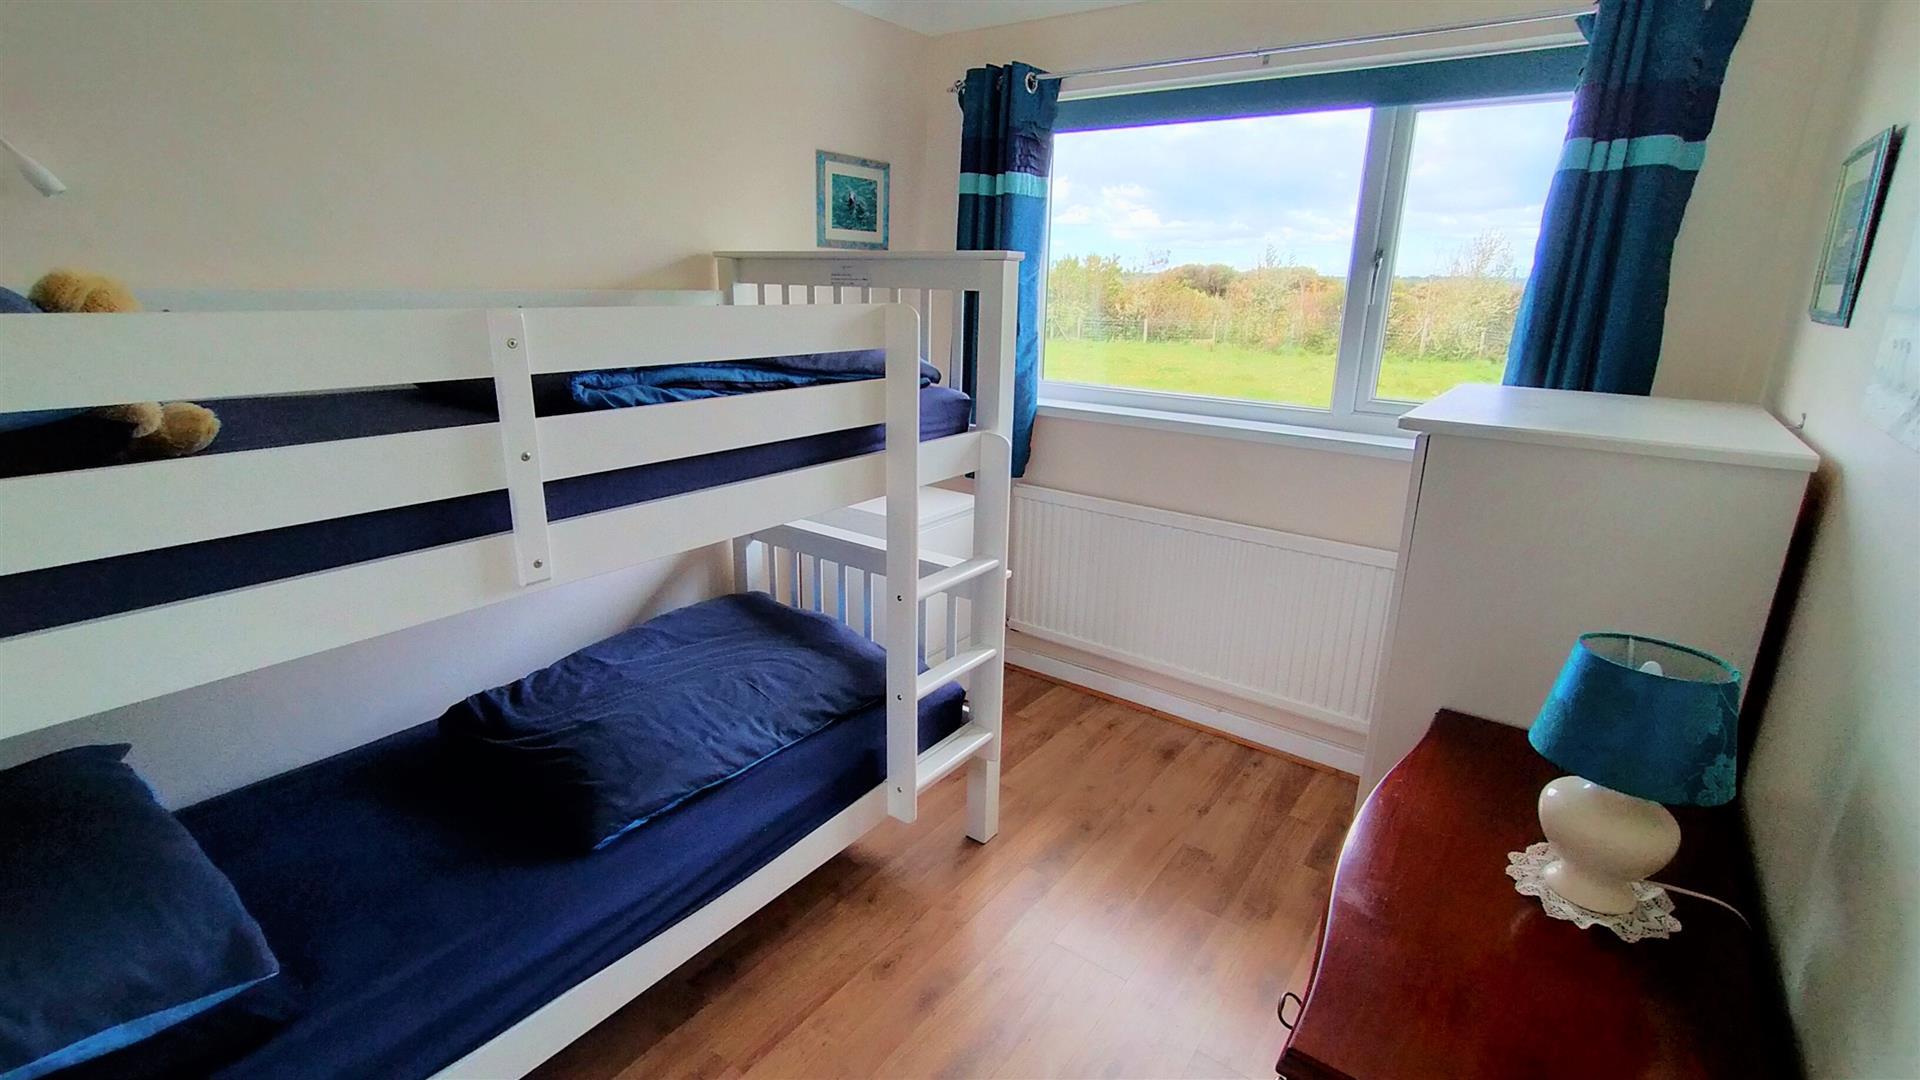 Bosco Lane, Pennard, Swansea, SA3 2AW